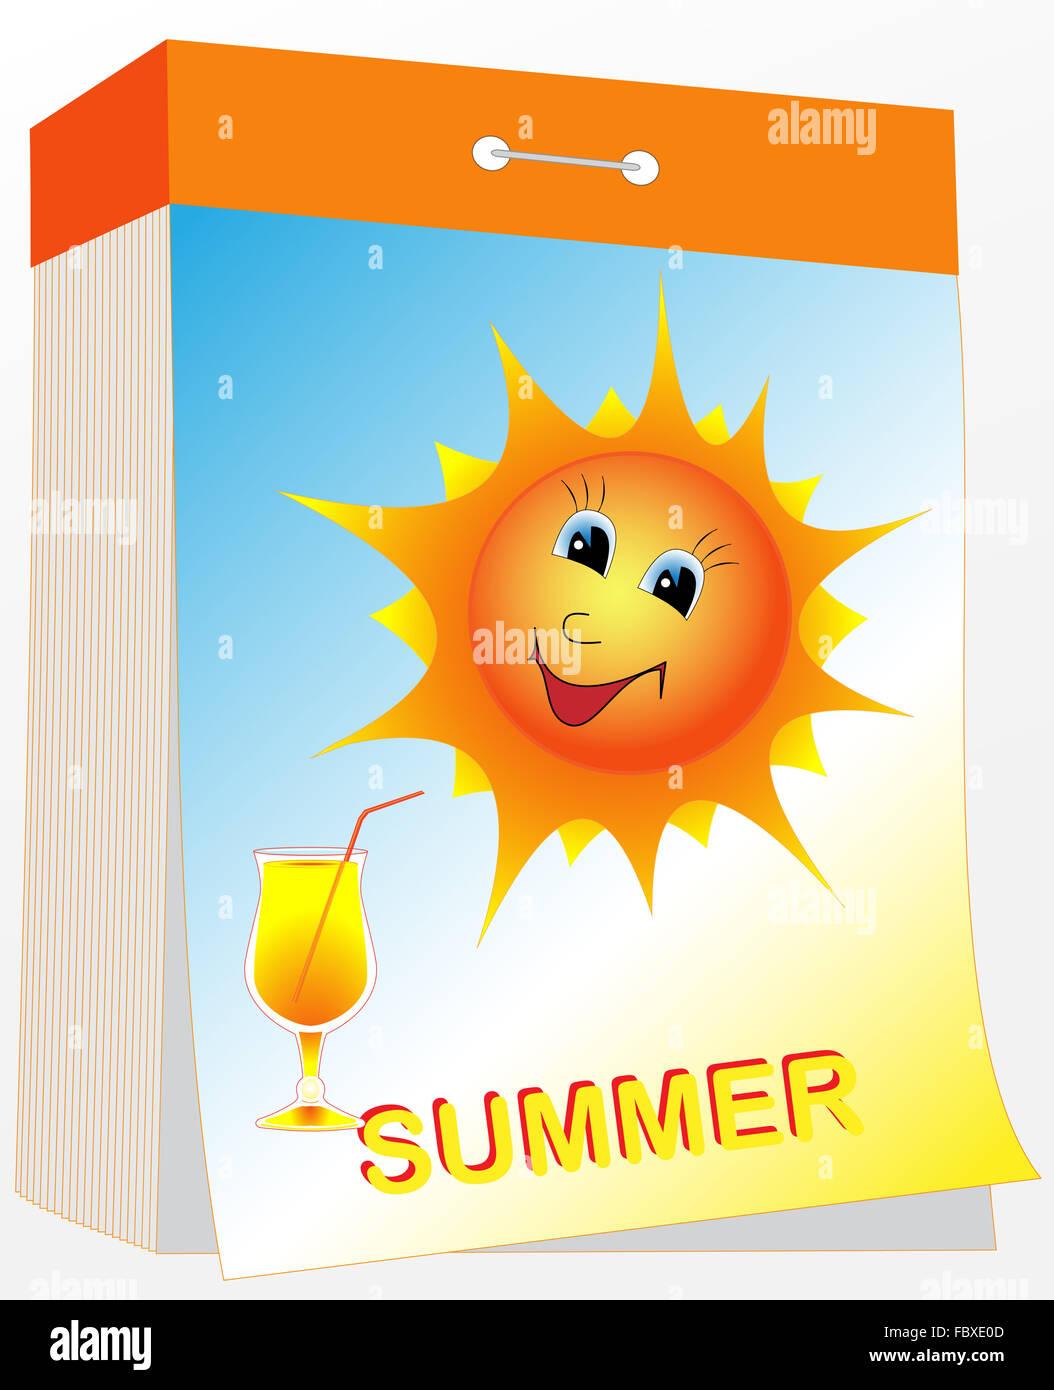 Wall tear-off calendar, summer - Stock Image